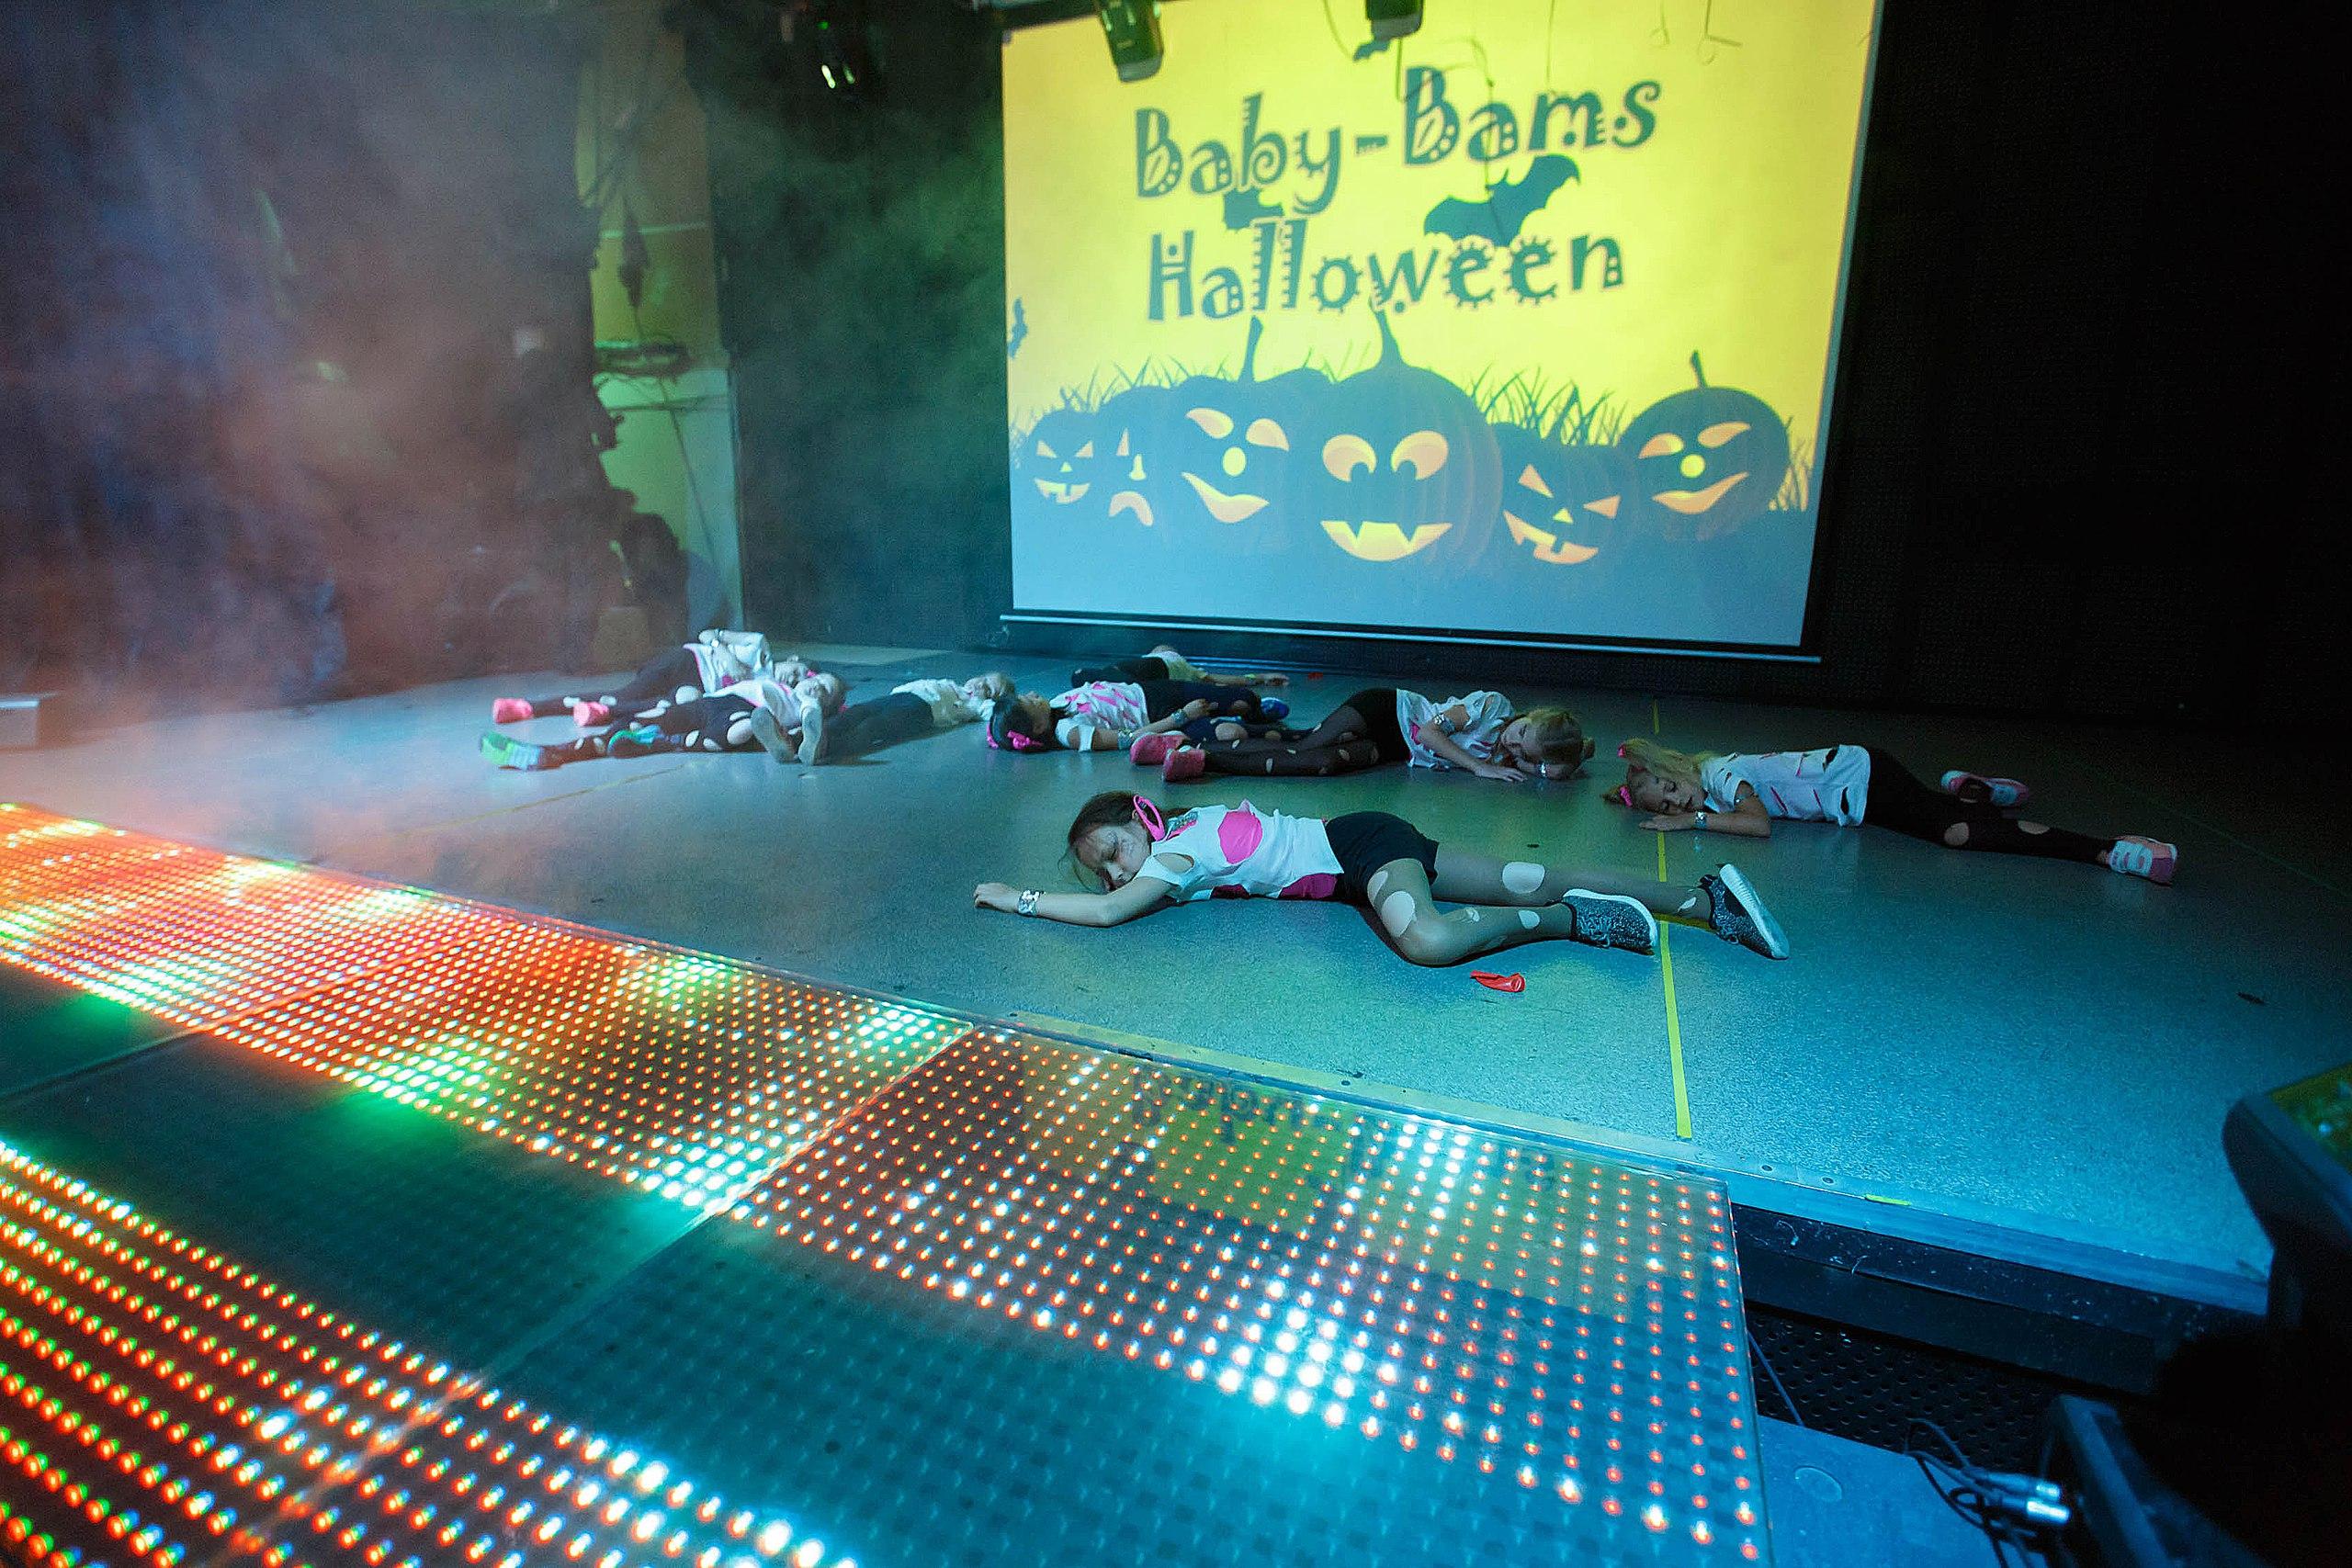 «Baby-bams Хэллоуин», 2017